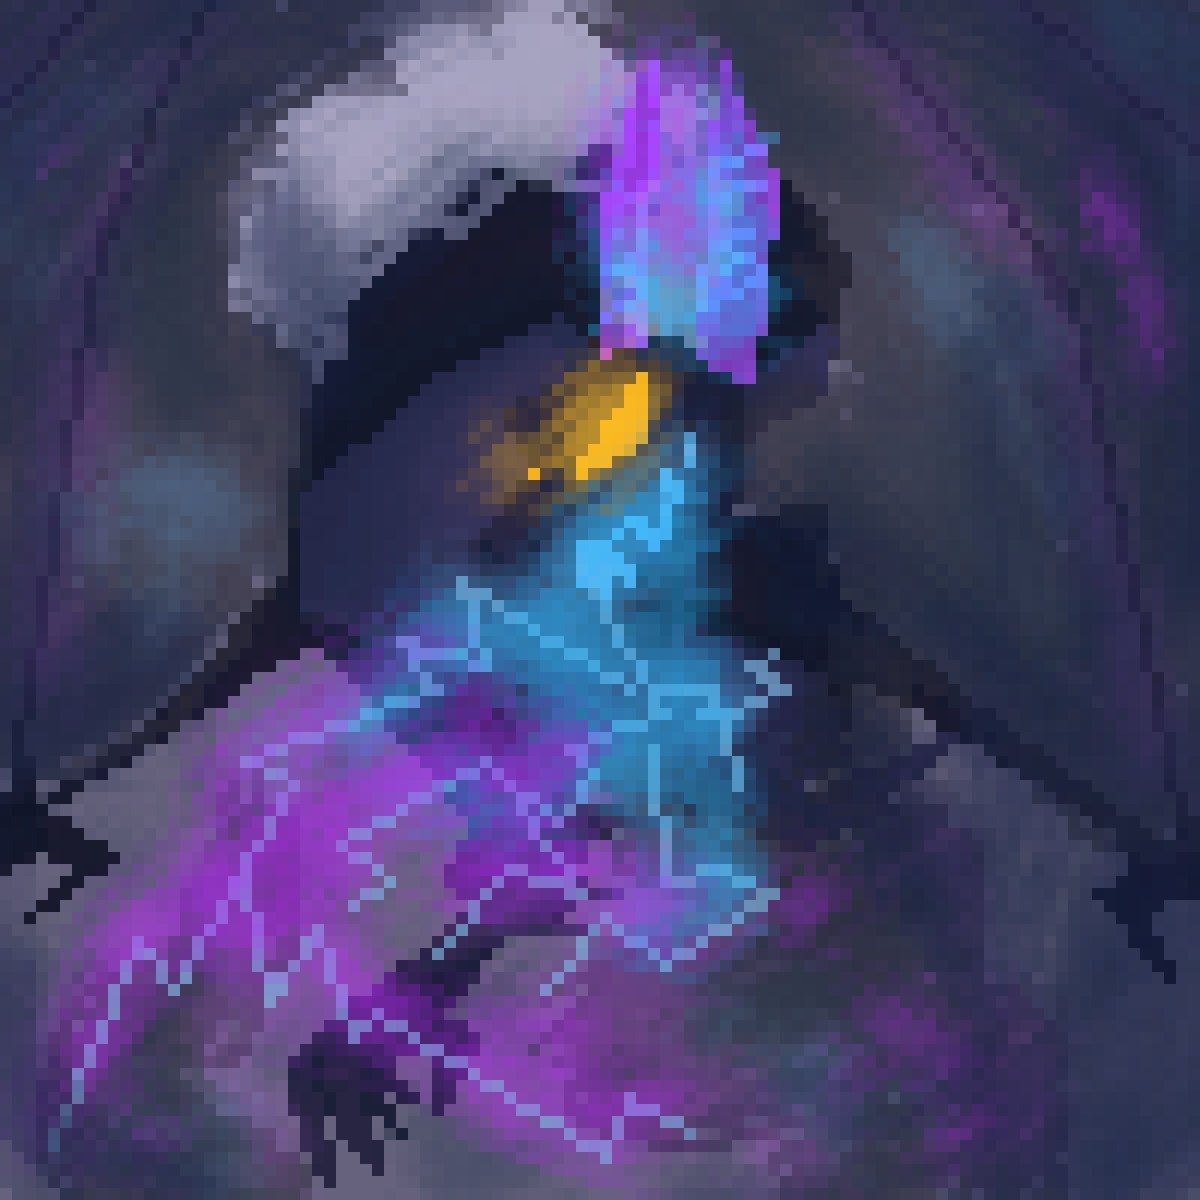 Ratorden- God of Storms by ScatteredLeaves